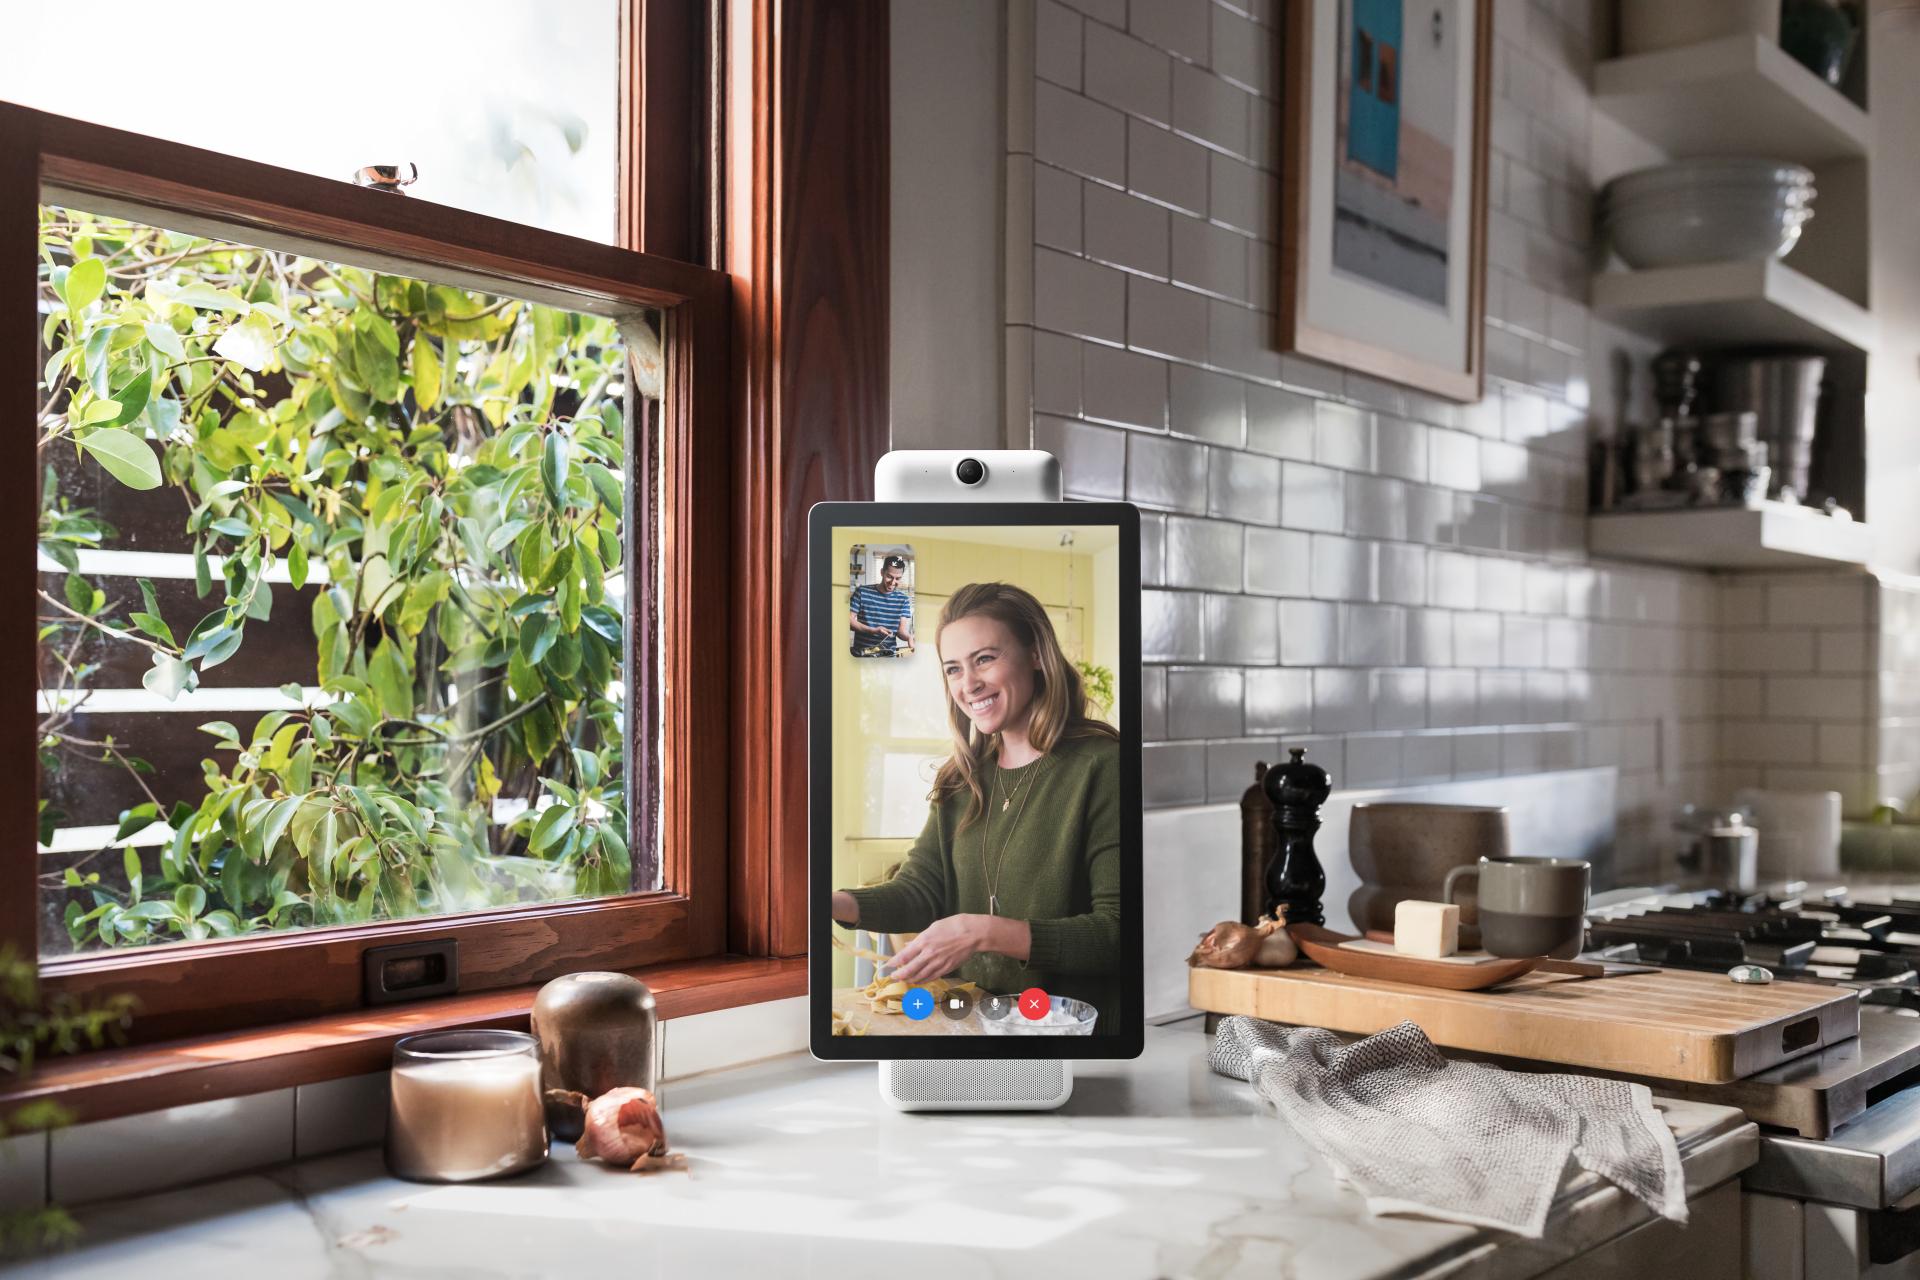 Facebook's Portal video screen.